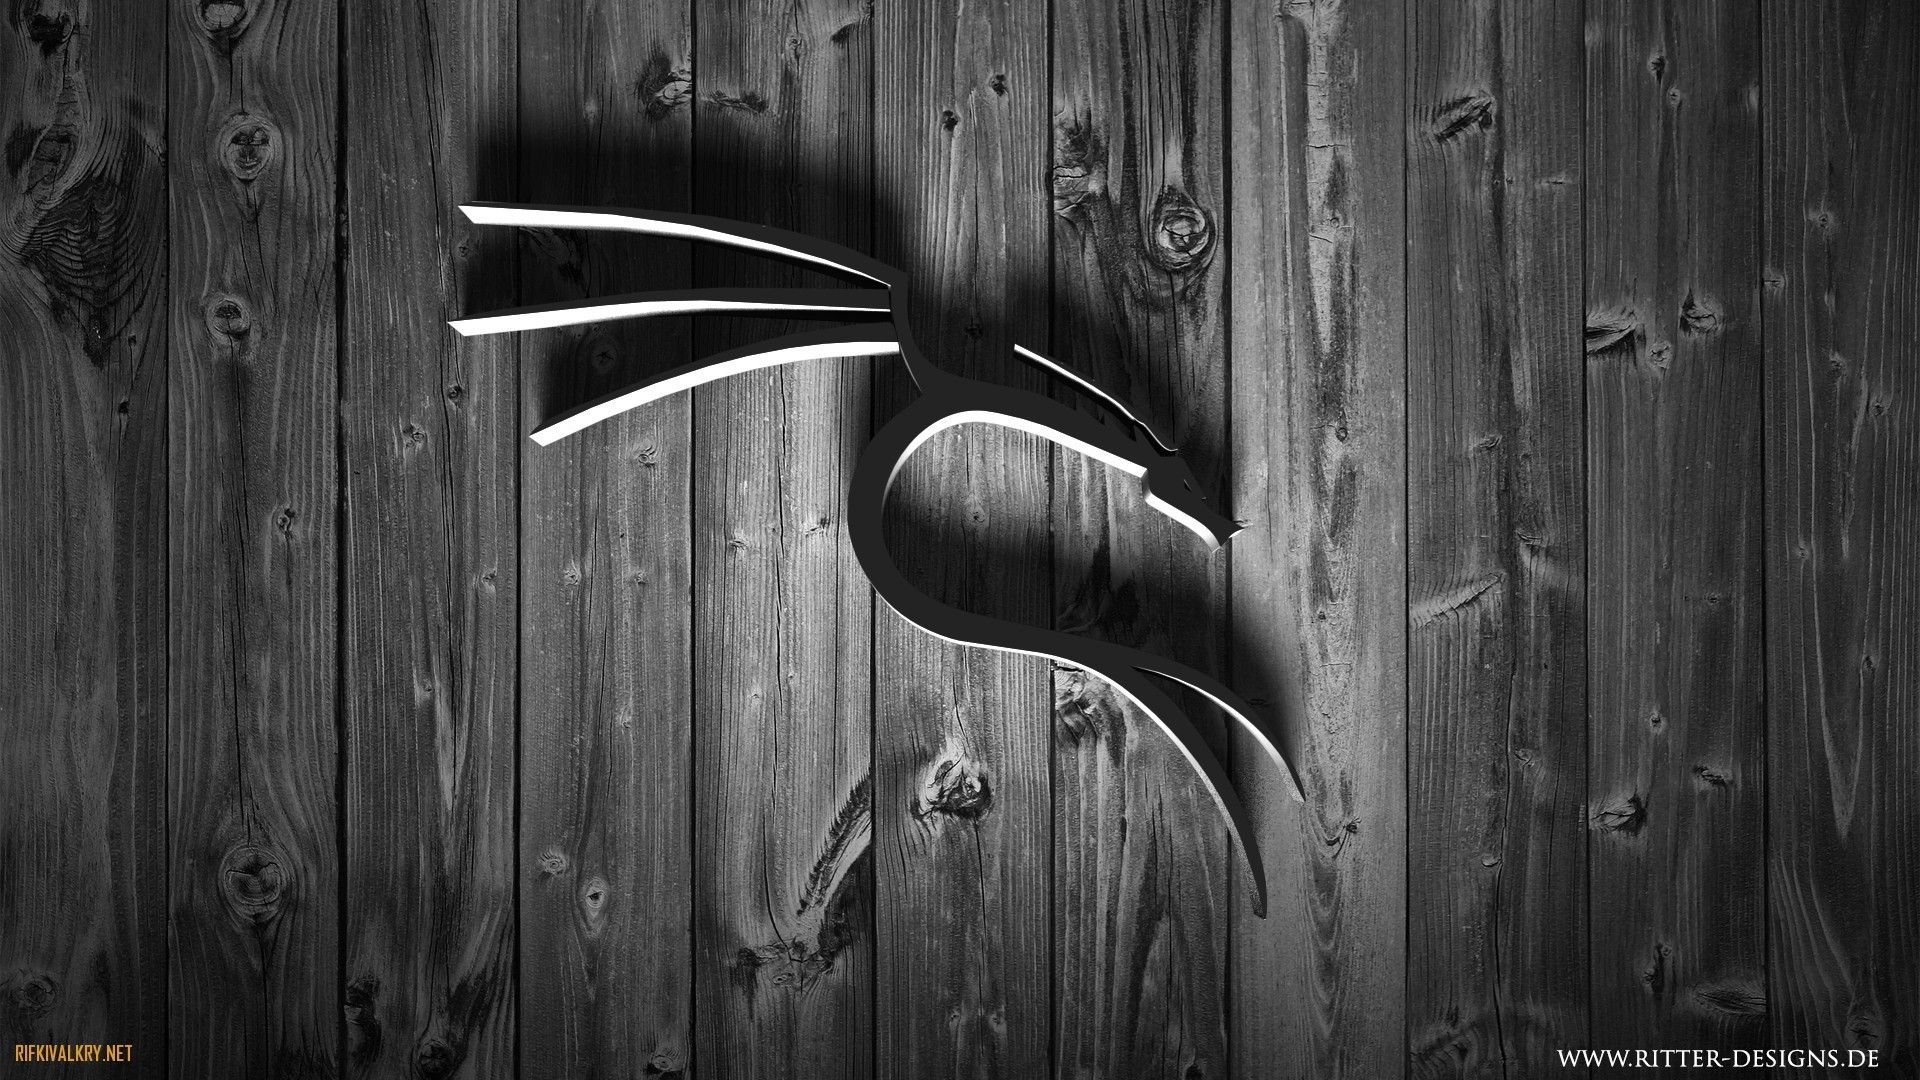 linux kali linux nethunter kali linux wallpaper …